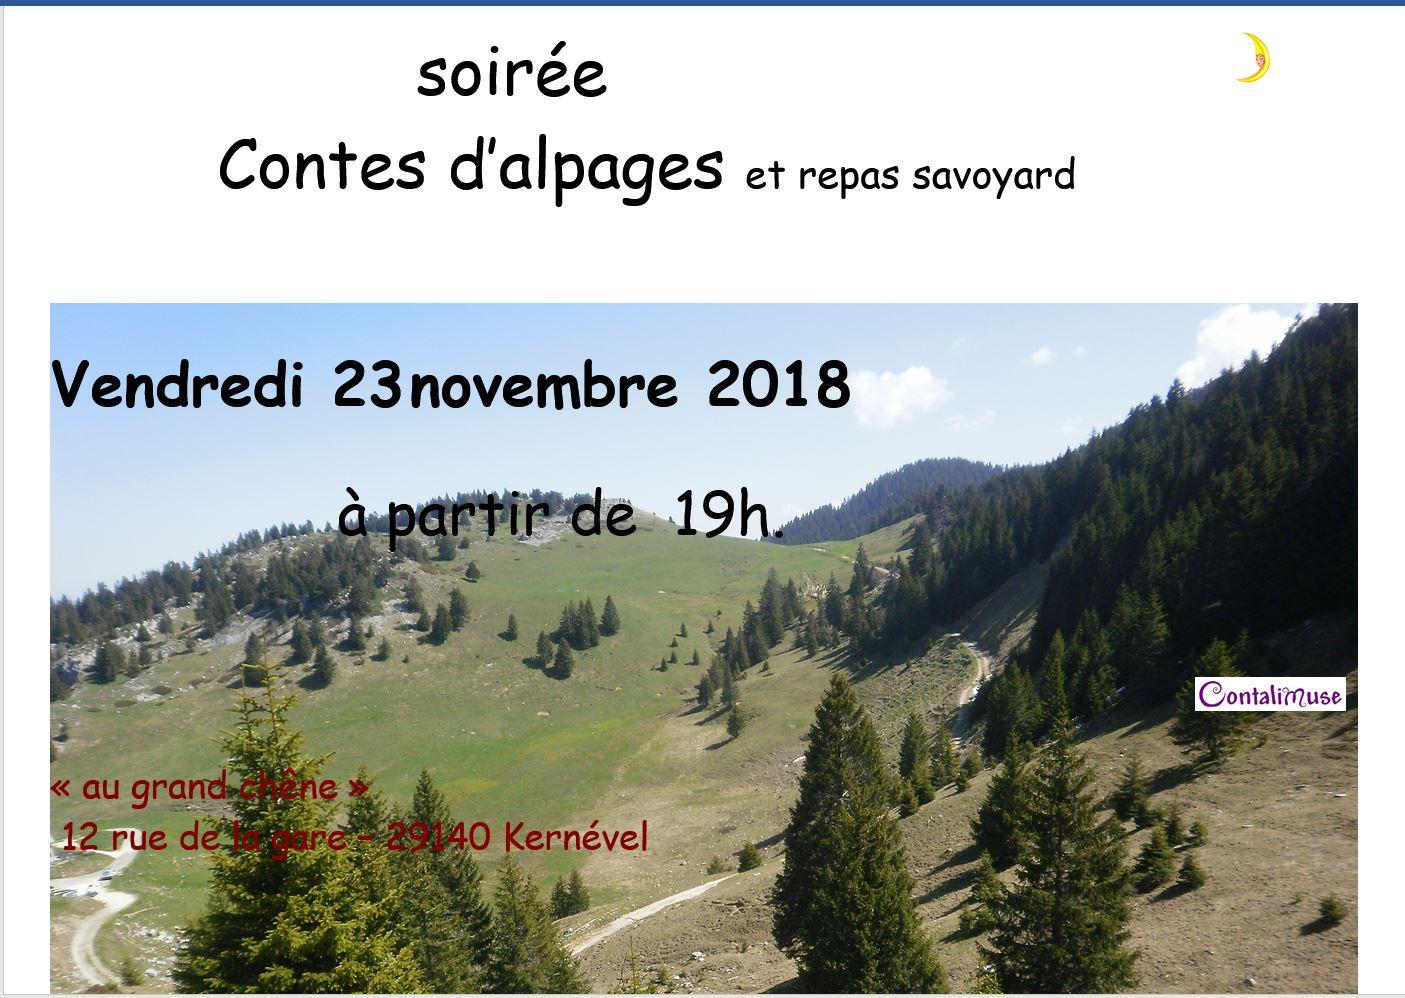 Contalimuse en Savoie